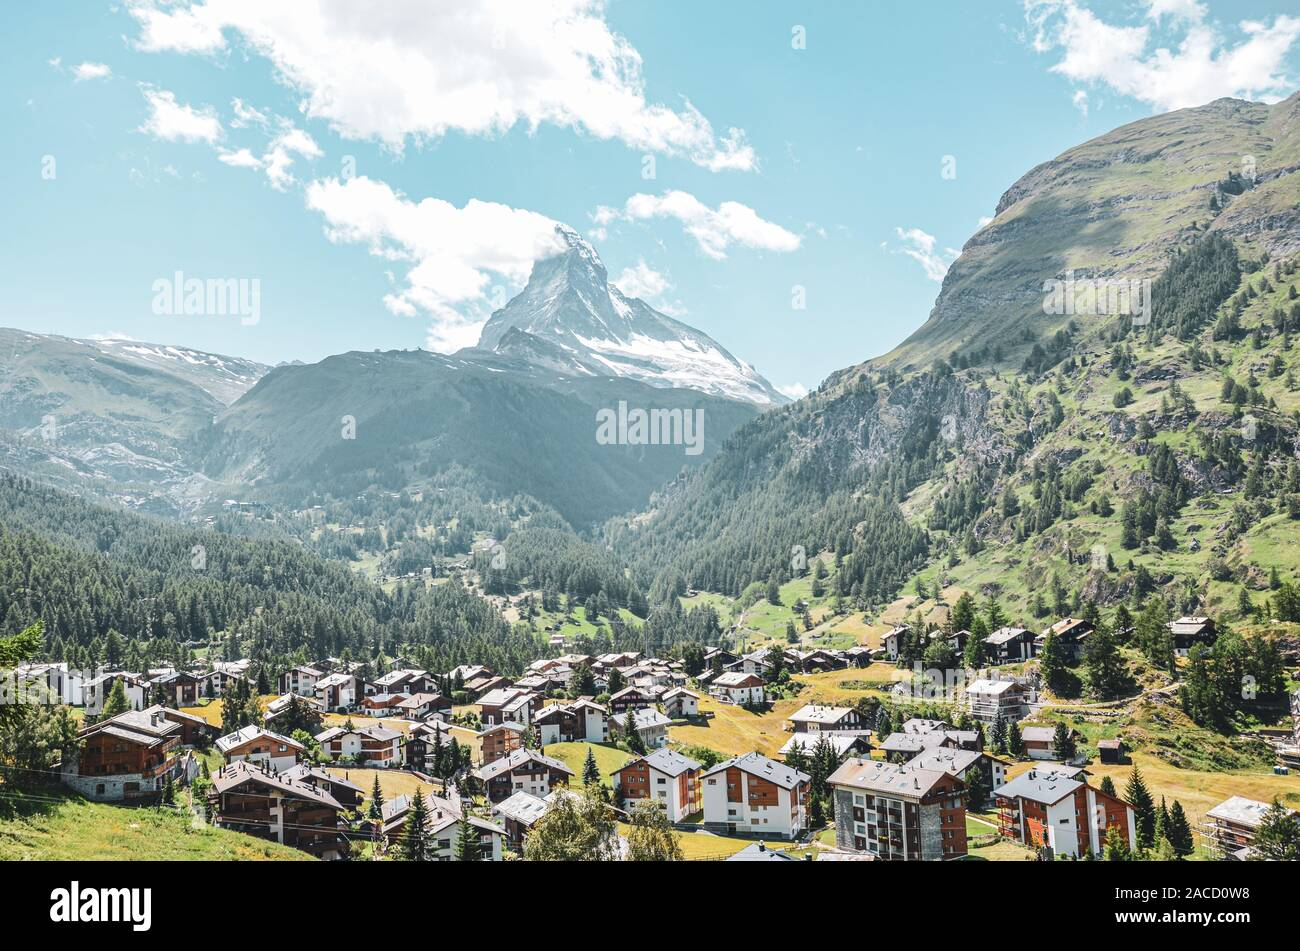 Picturesque Alpine village Zermatt in Switzerland in the summer season. Famous Matterhorn mountain in the background. Typical Alpine mountain huts. Swiss Alps, Alpine landscapes. Stock Photo